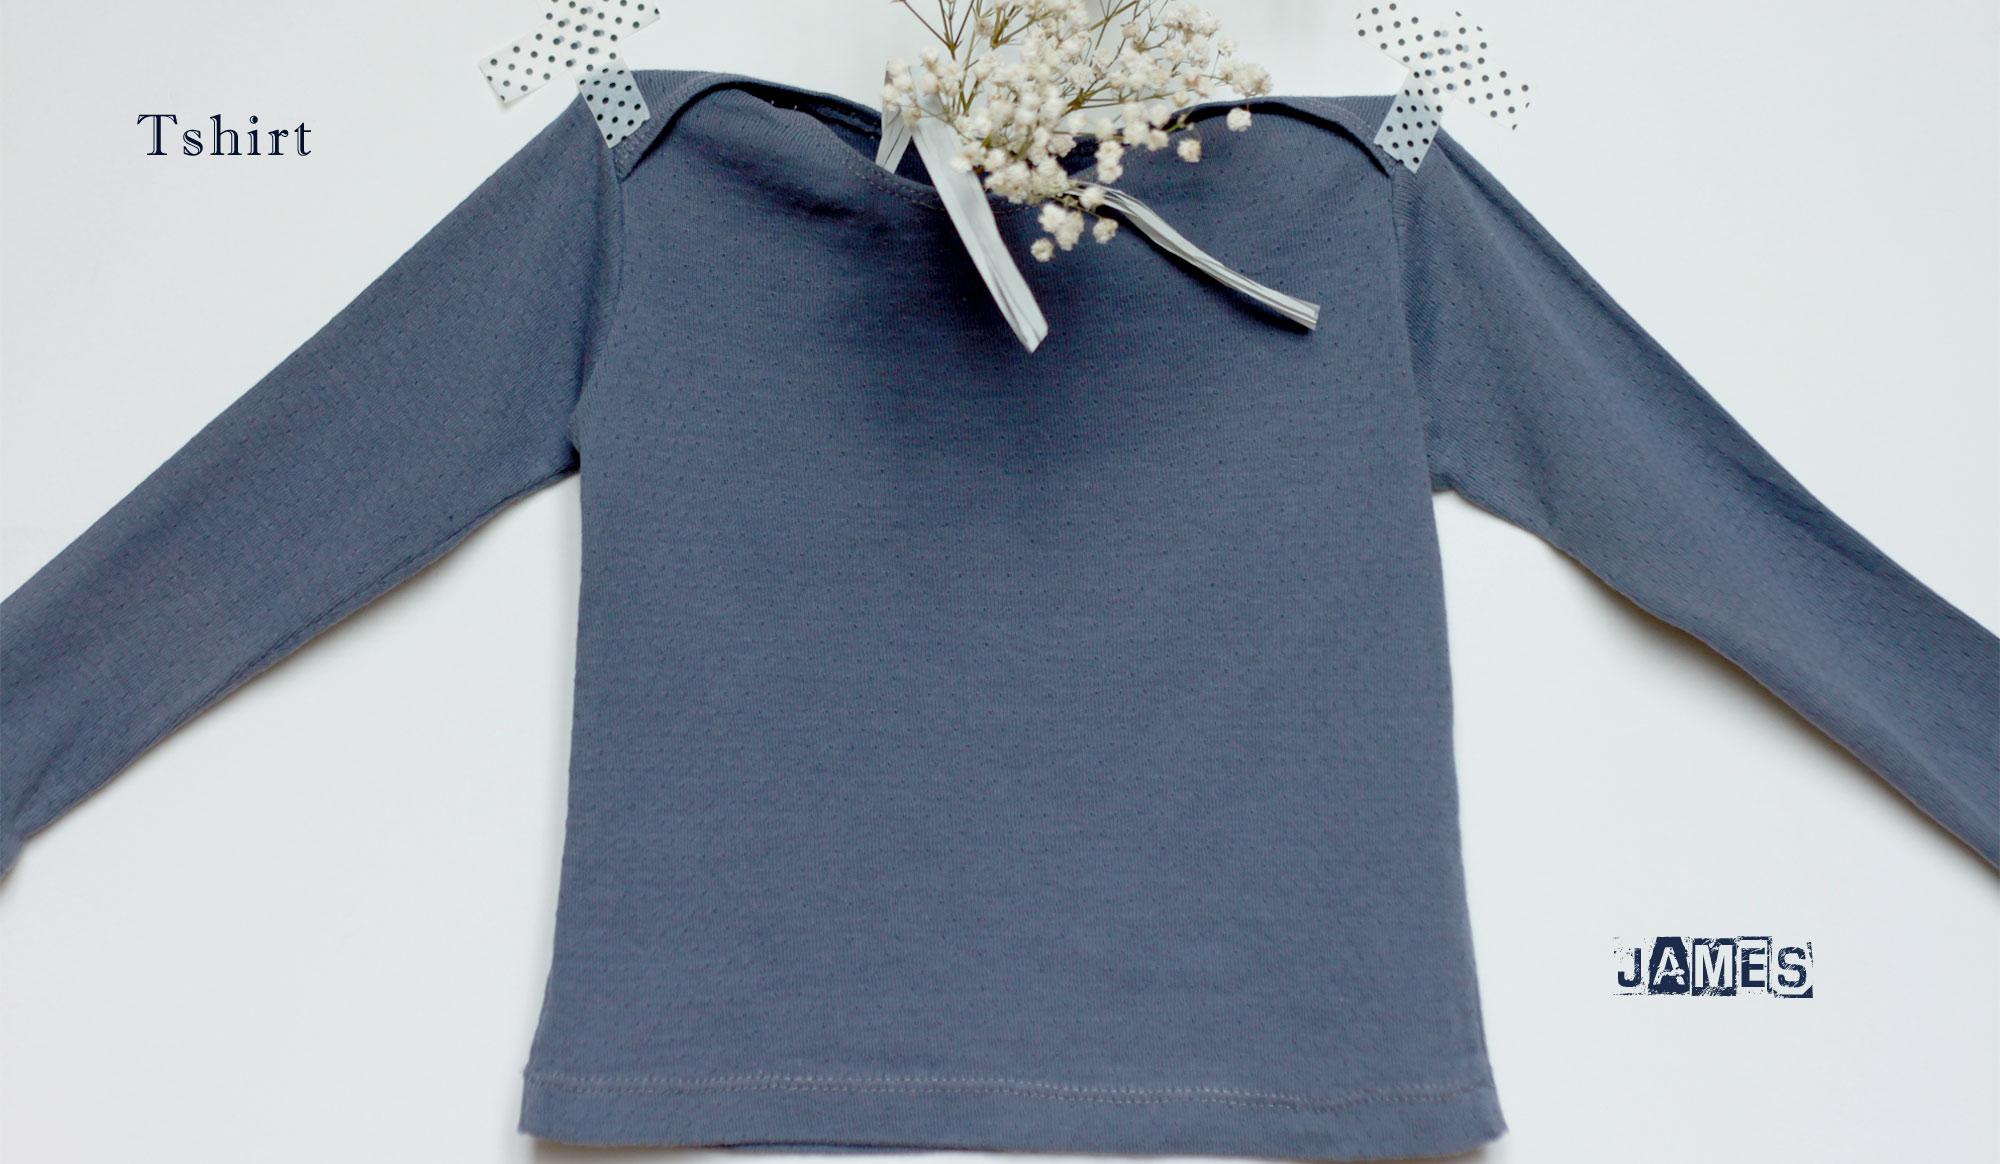 slider-jersey-ajouré-encre-tshirt-James-atelier-scammit